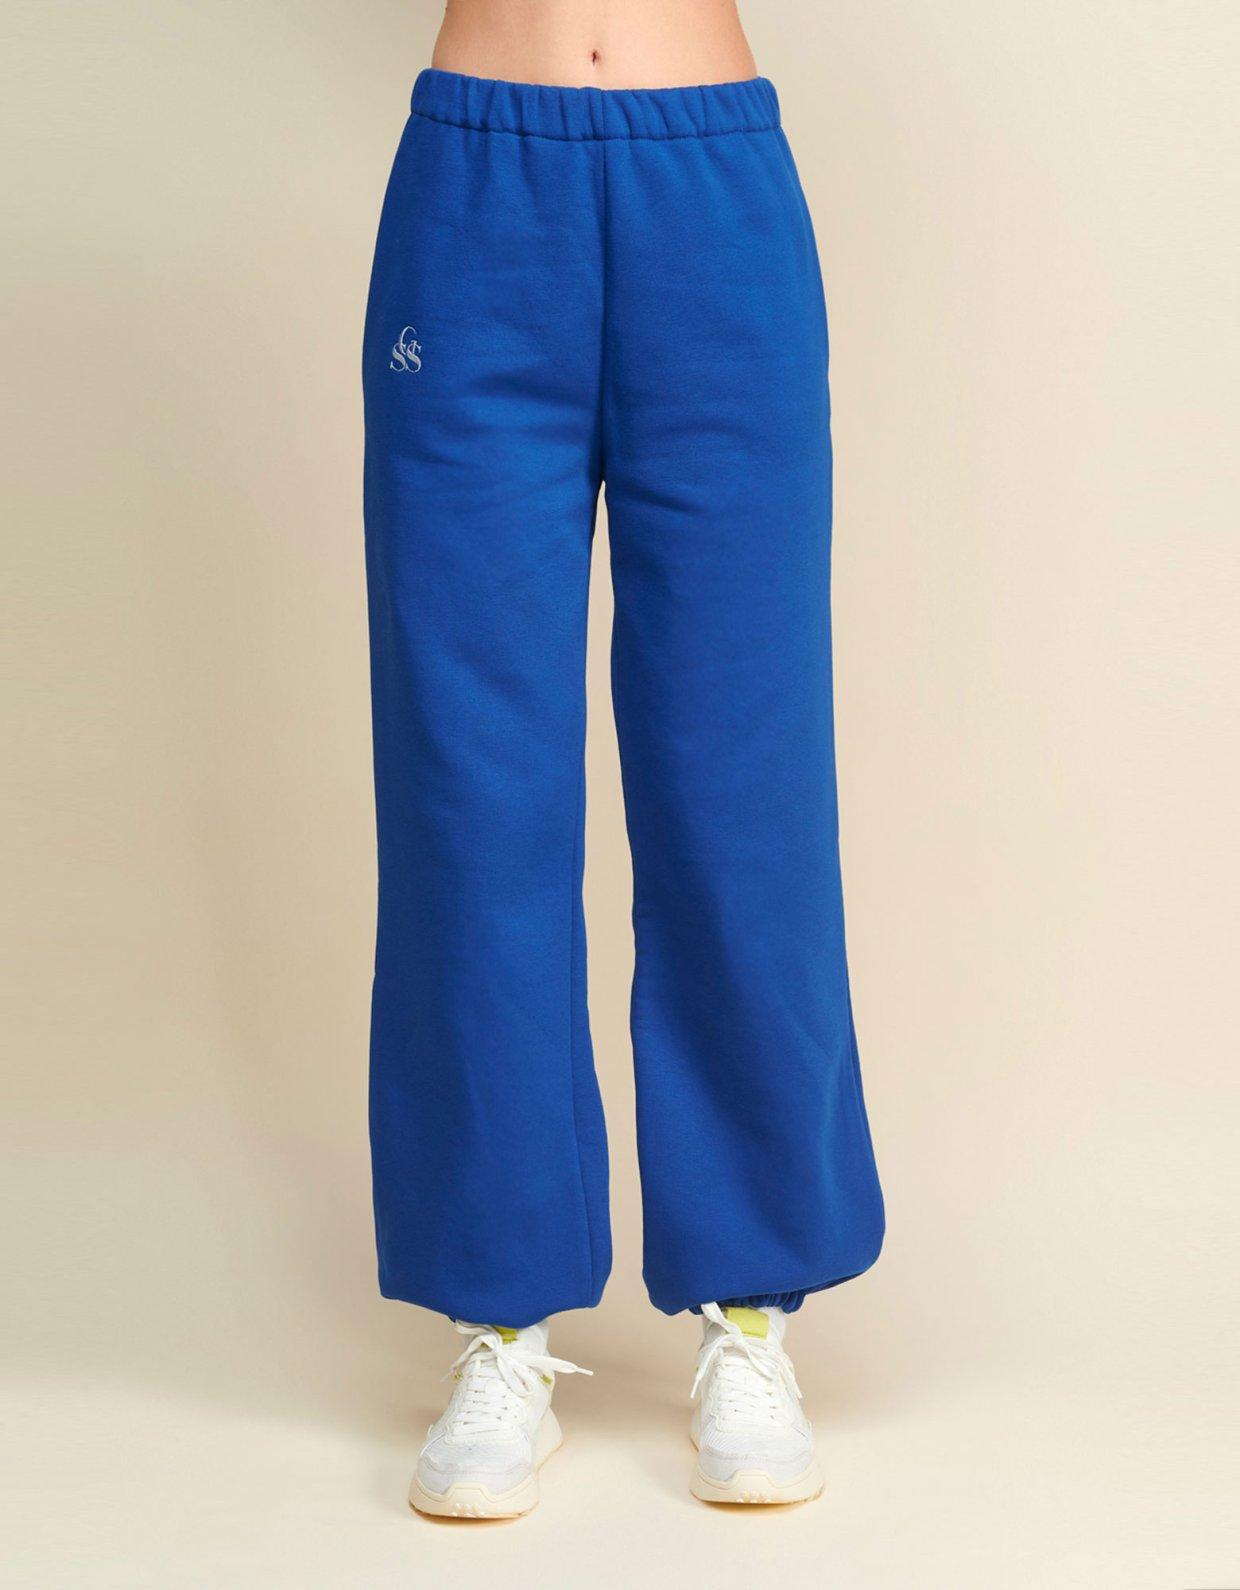 Sunset go Nadine SSG blue track pants